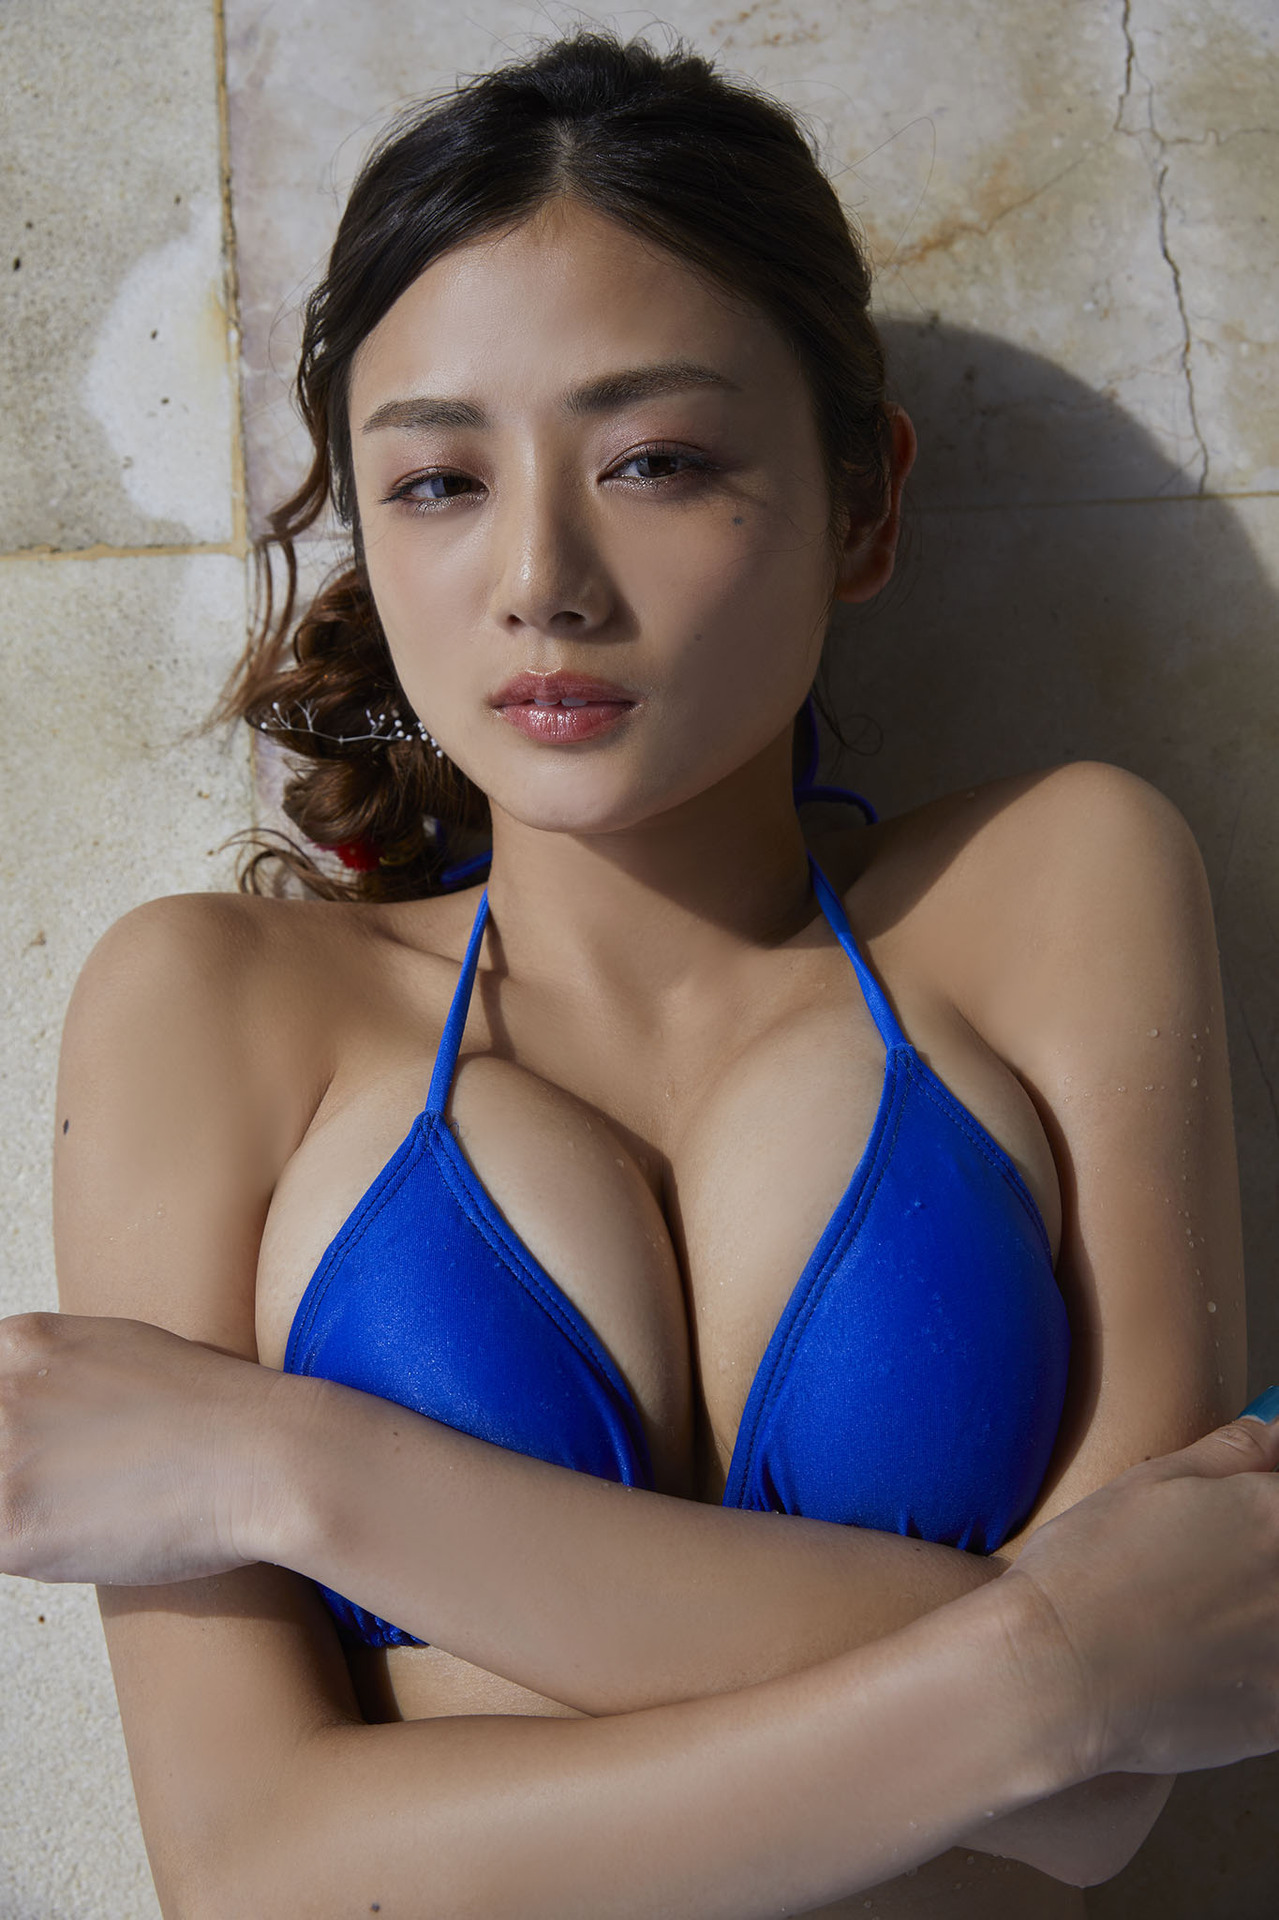 片山萌美 Poker Face 00060